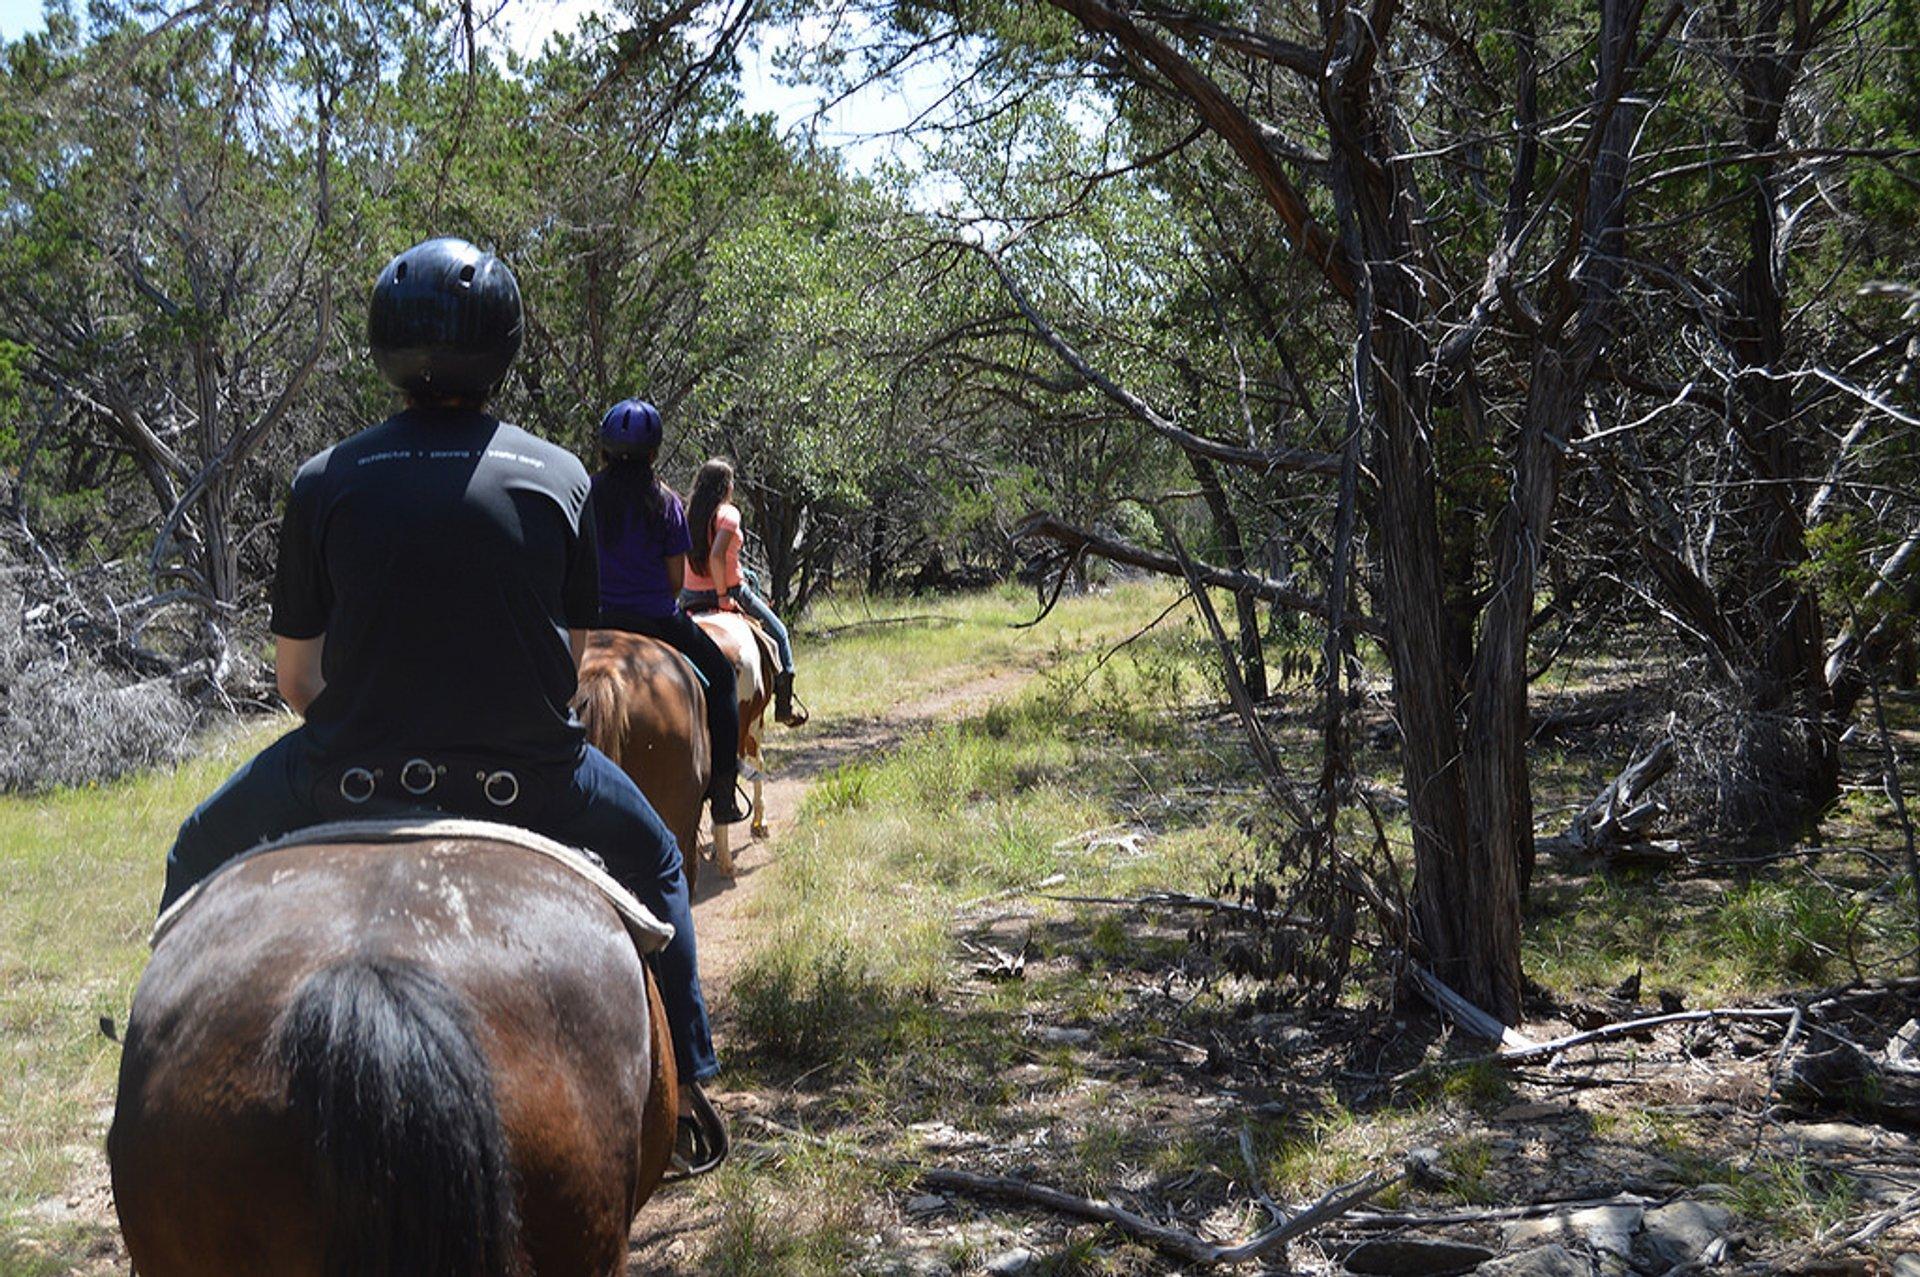 Horseback Riding in Texas - Best Season 2020